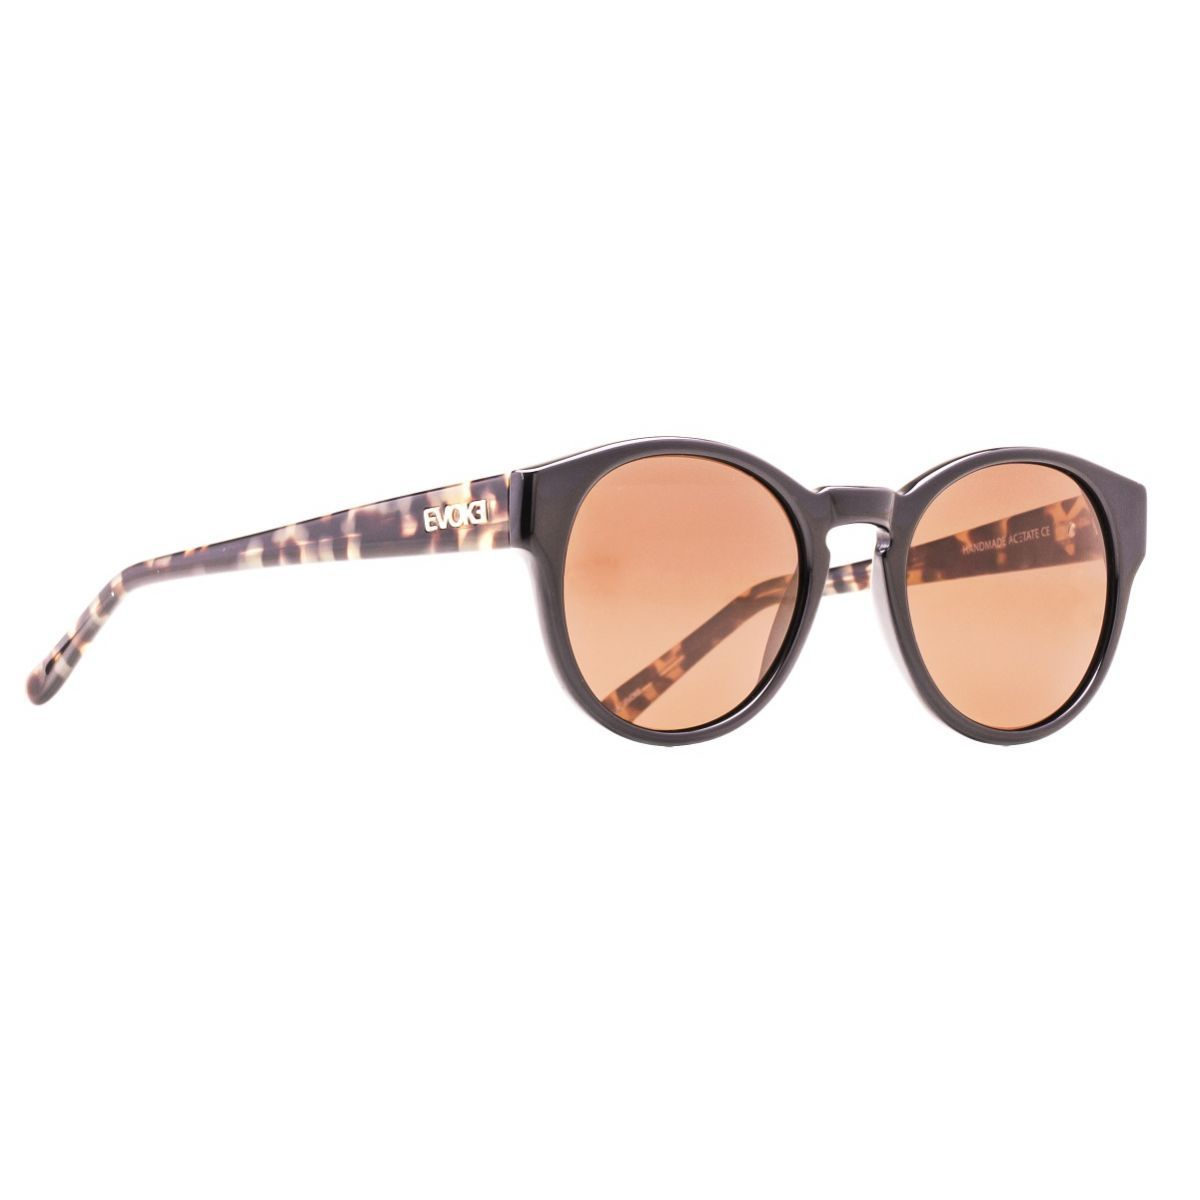 Oculos Solar Evoke EVK16 Black Shine Temple Demi Blond Gold Brown Total